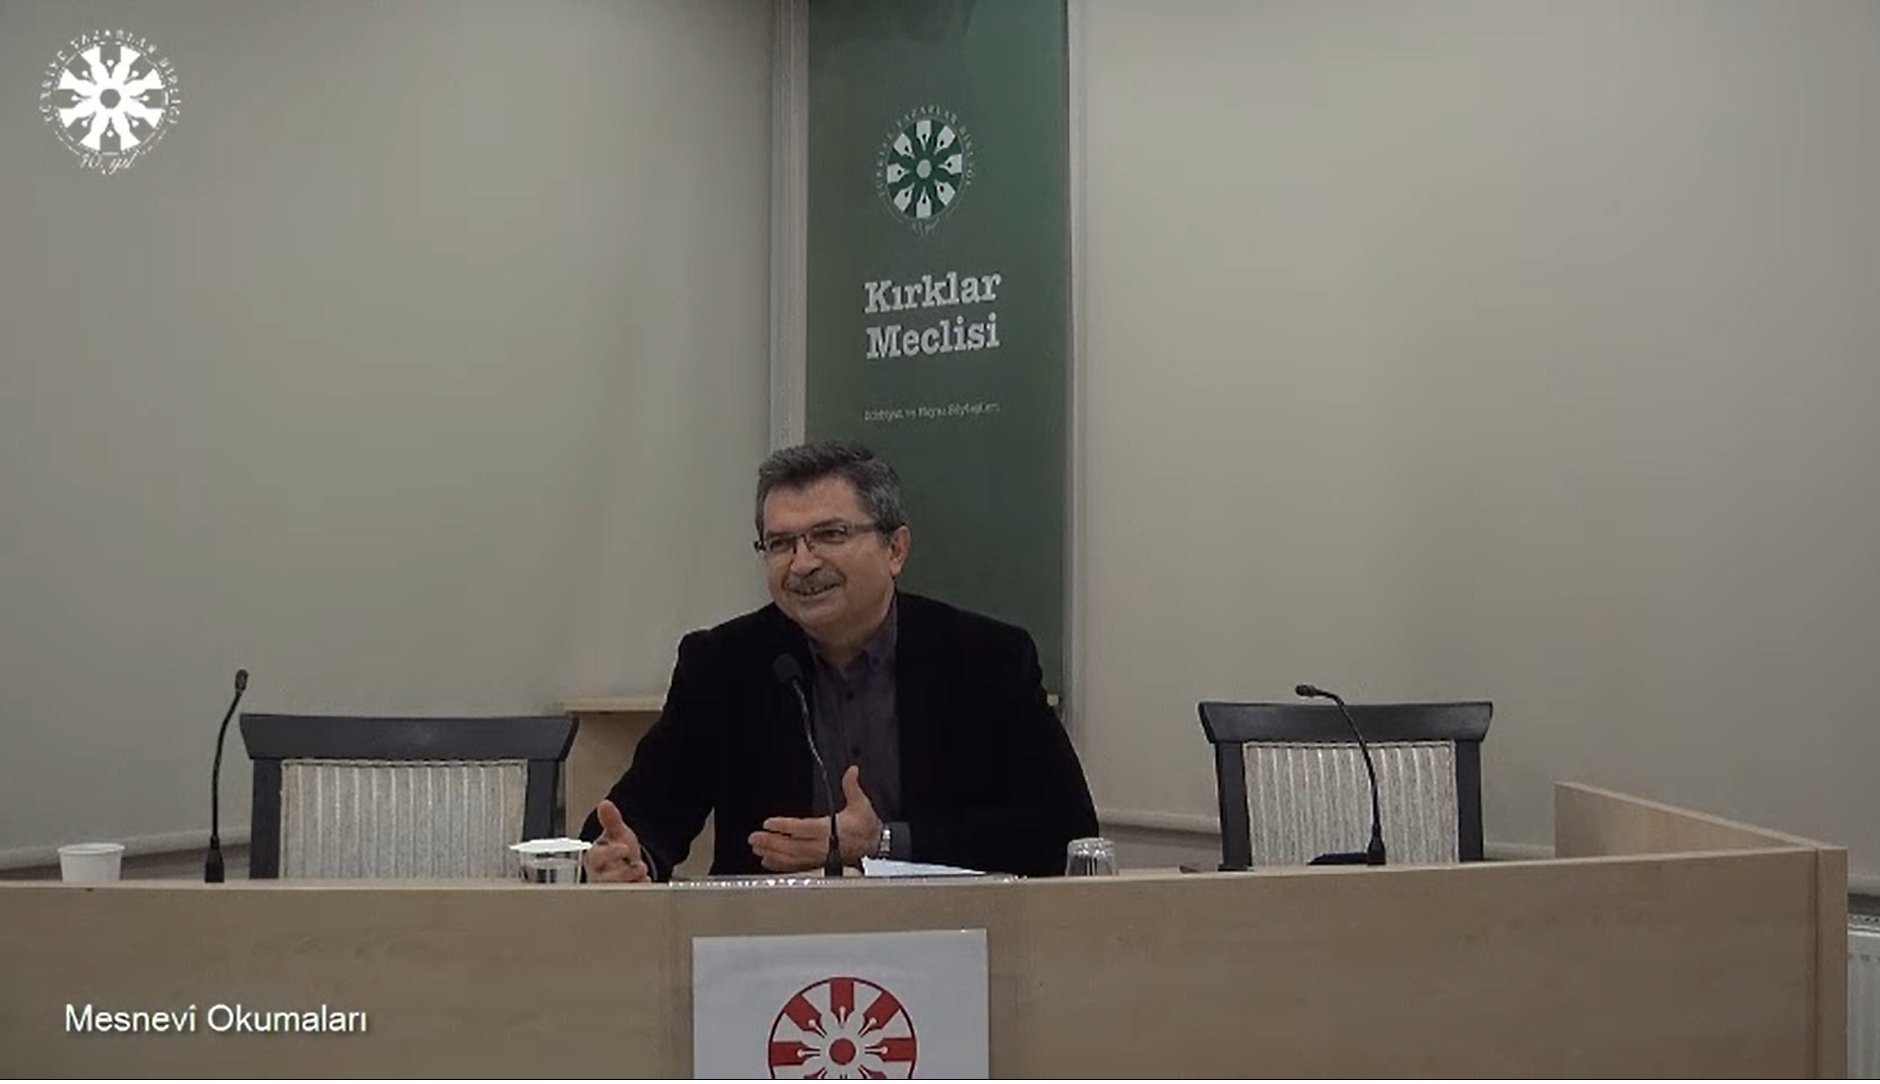 Mesnevî Okumaları -55- Dr. Fahrettin Coşguner